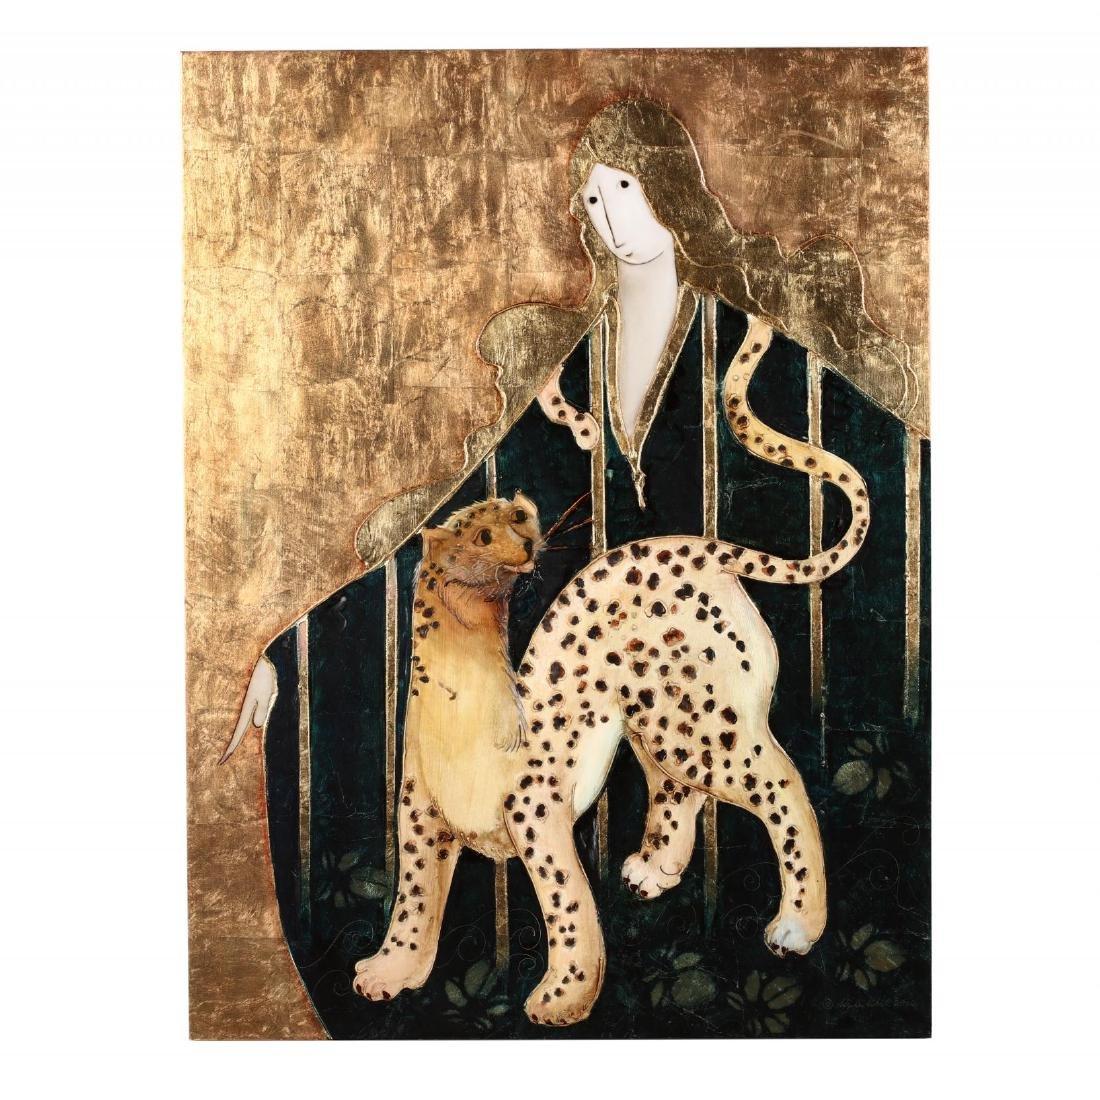 Stephen White (NC), Woman with Cheetah